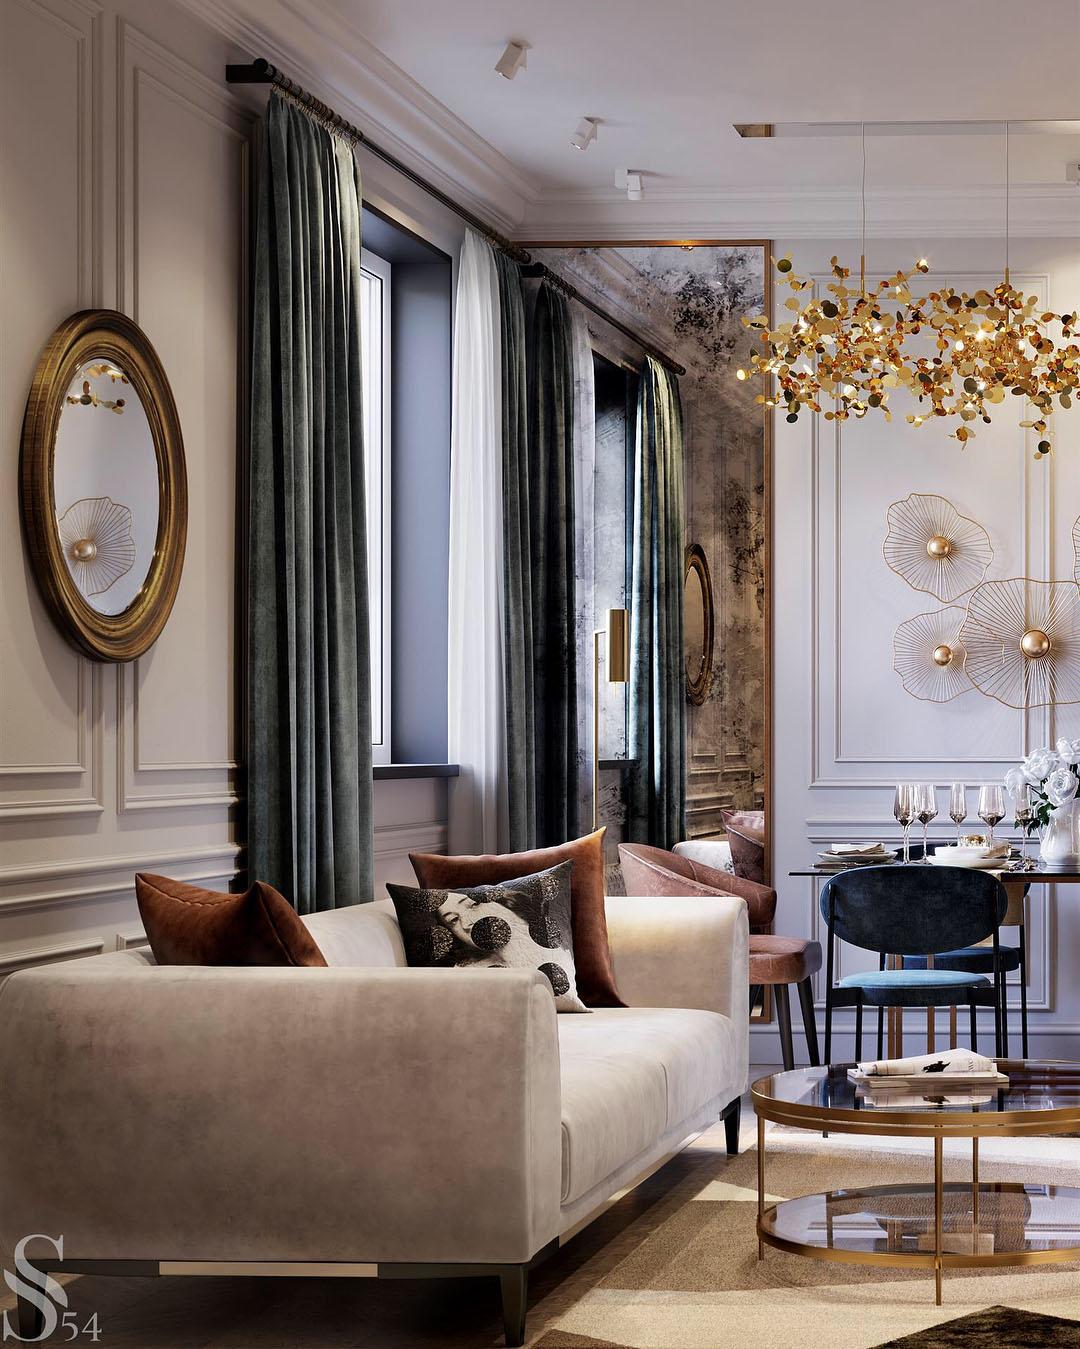 Interior Design Inspirations: The Best Interiors On Instagram